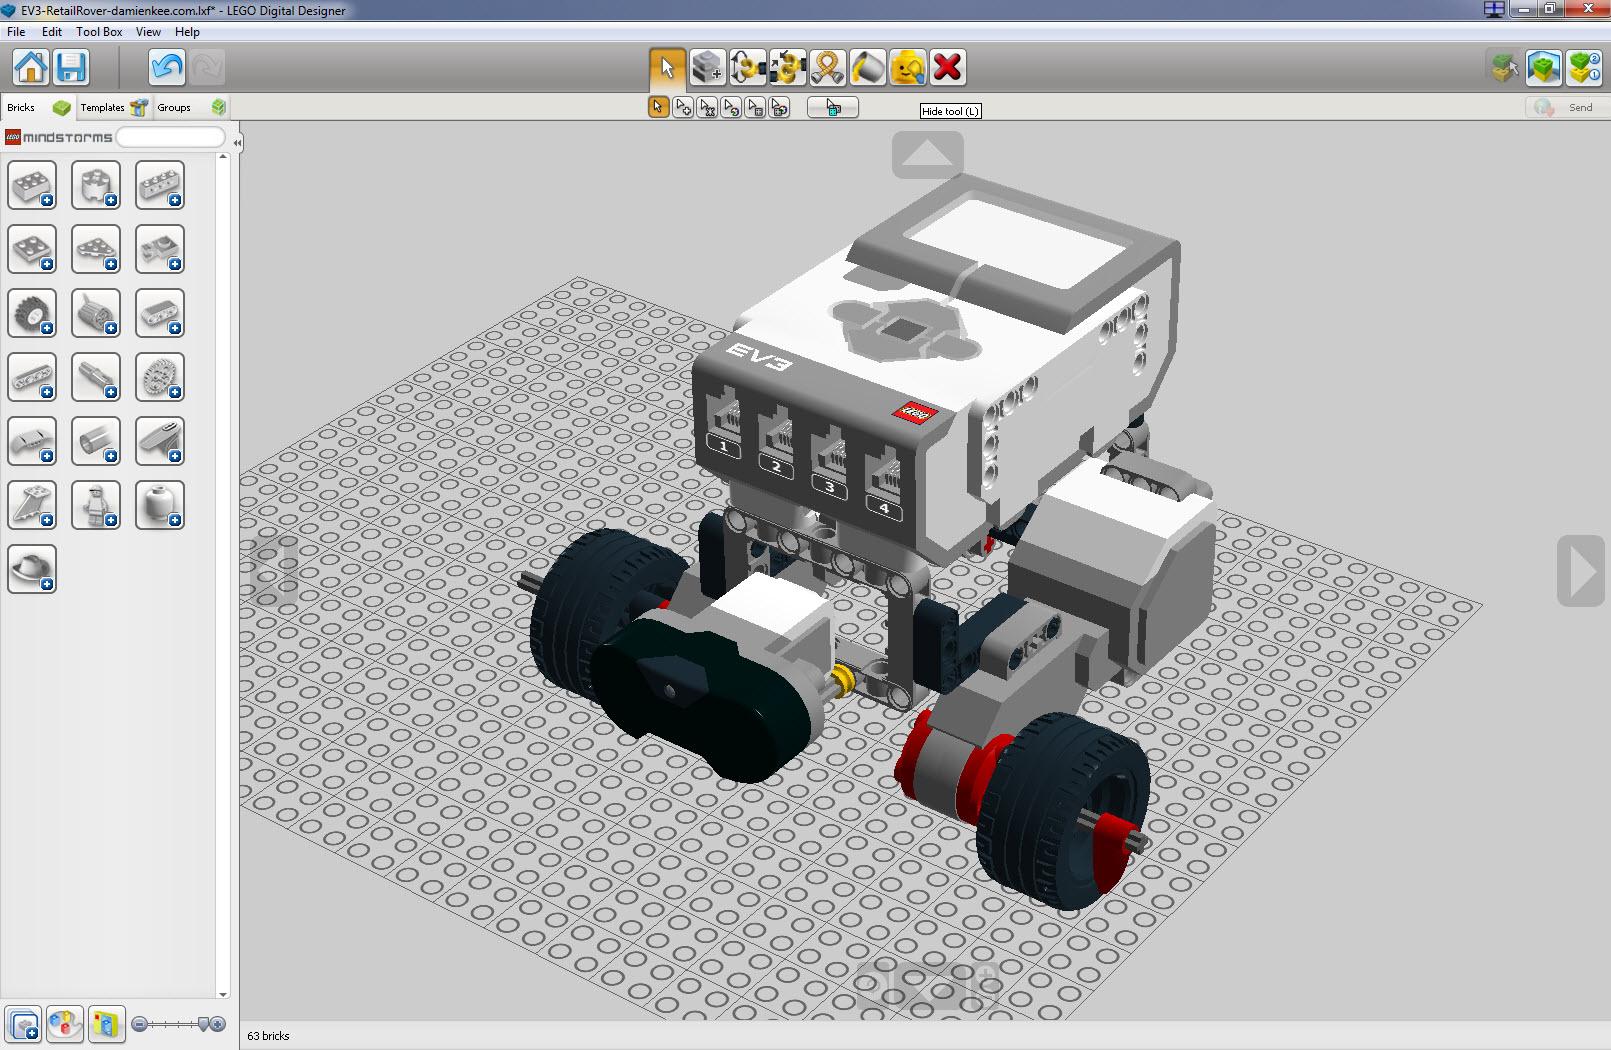 Introducing Lego Digital Designer Virtual Robotics Toolkit